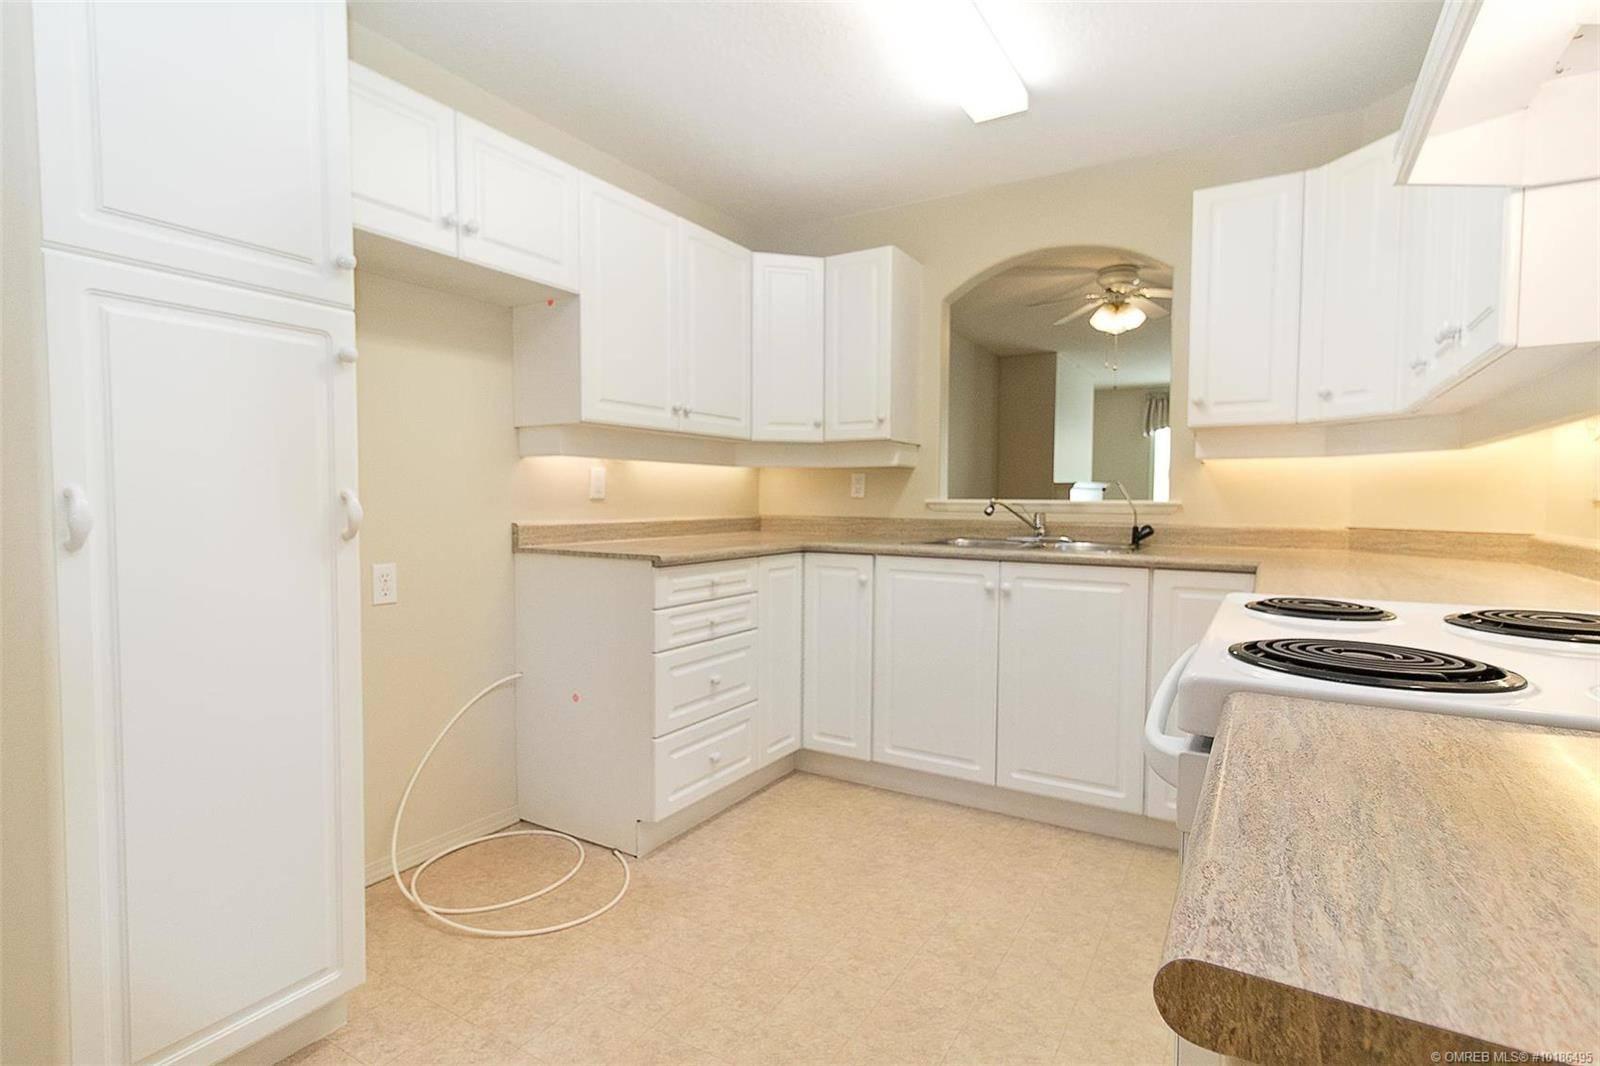 Condo for sale at 555 Houghton Rd Unit 206 Kelowna British Columbia - MLS: 10186495